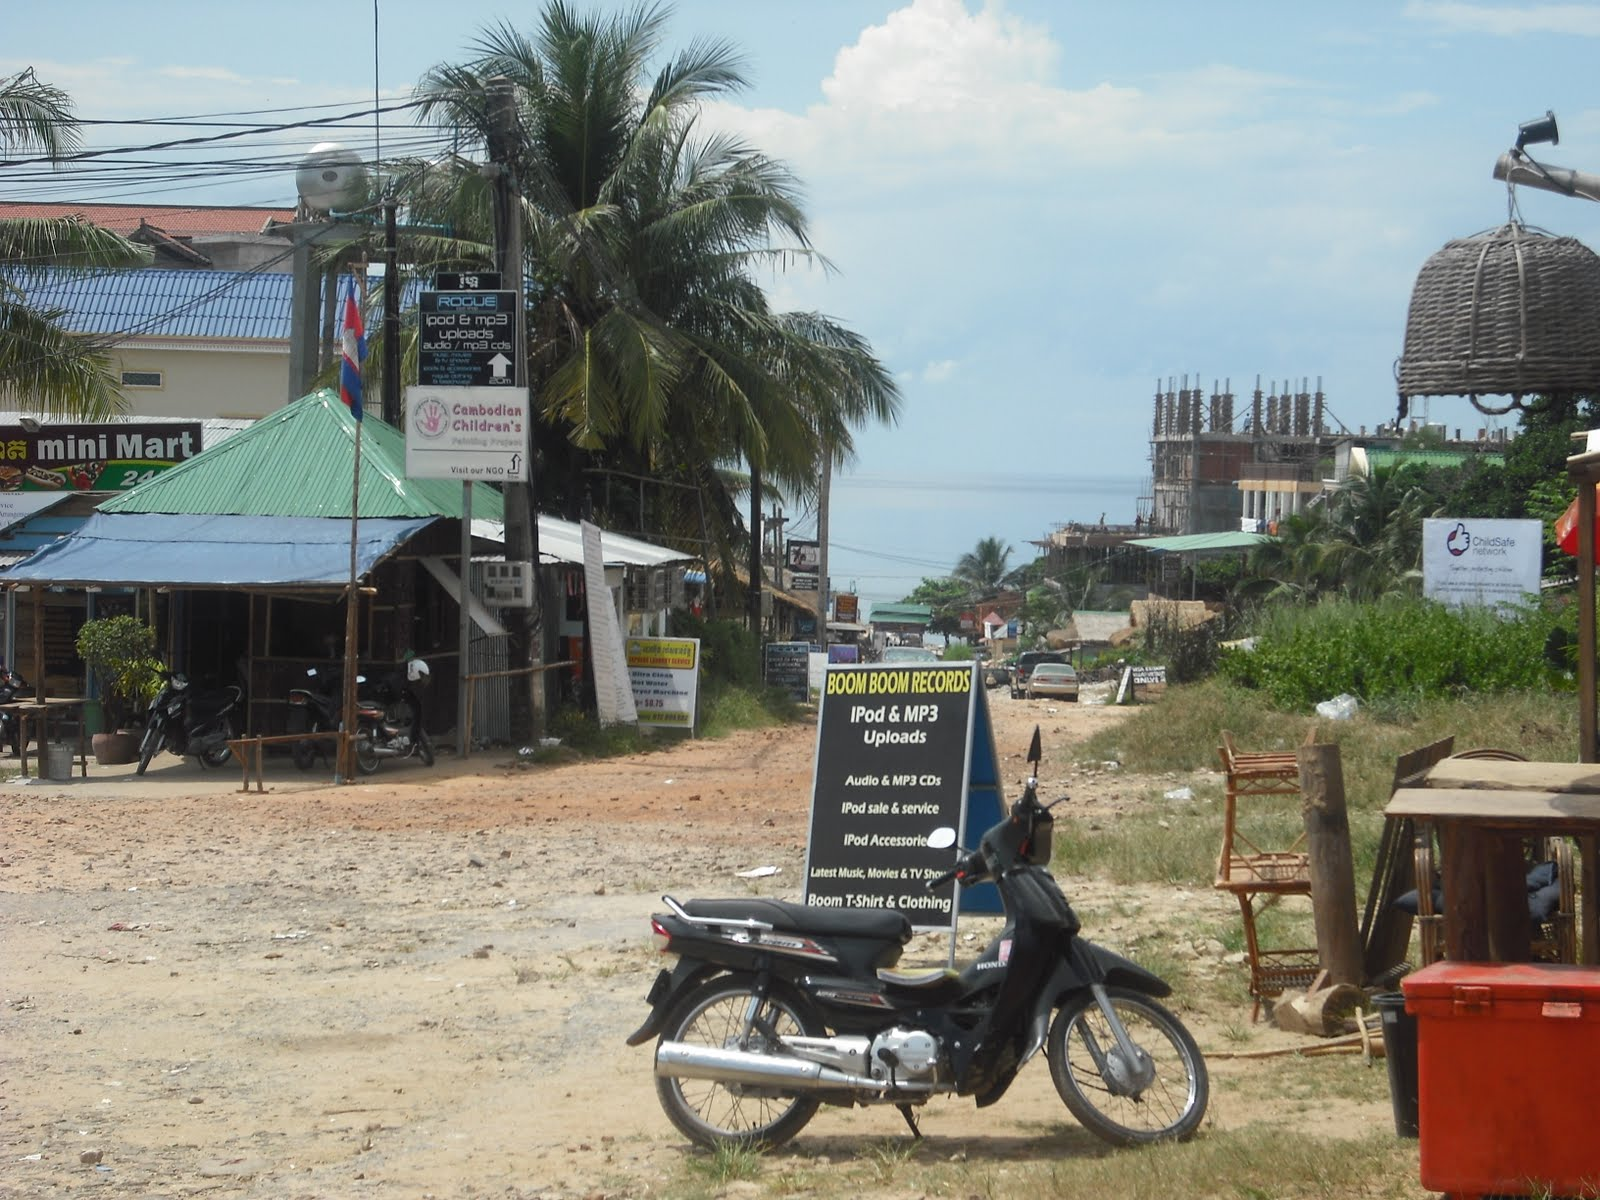 Harfang Perdu: Sihanoukville = poop